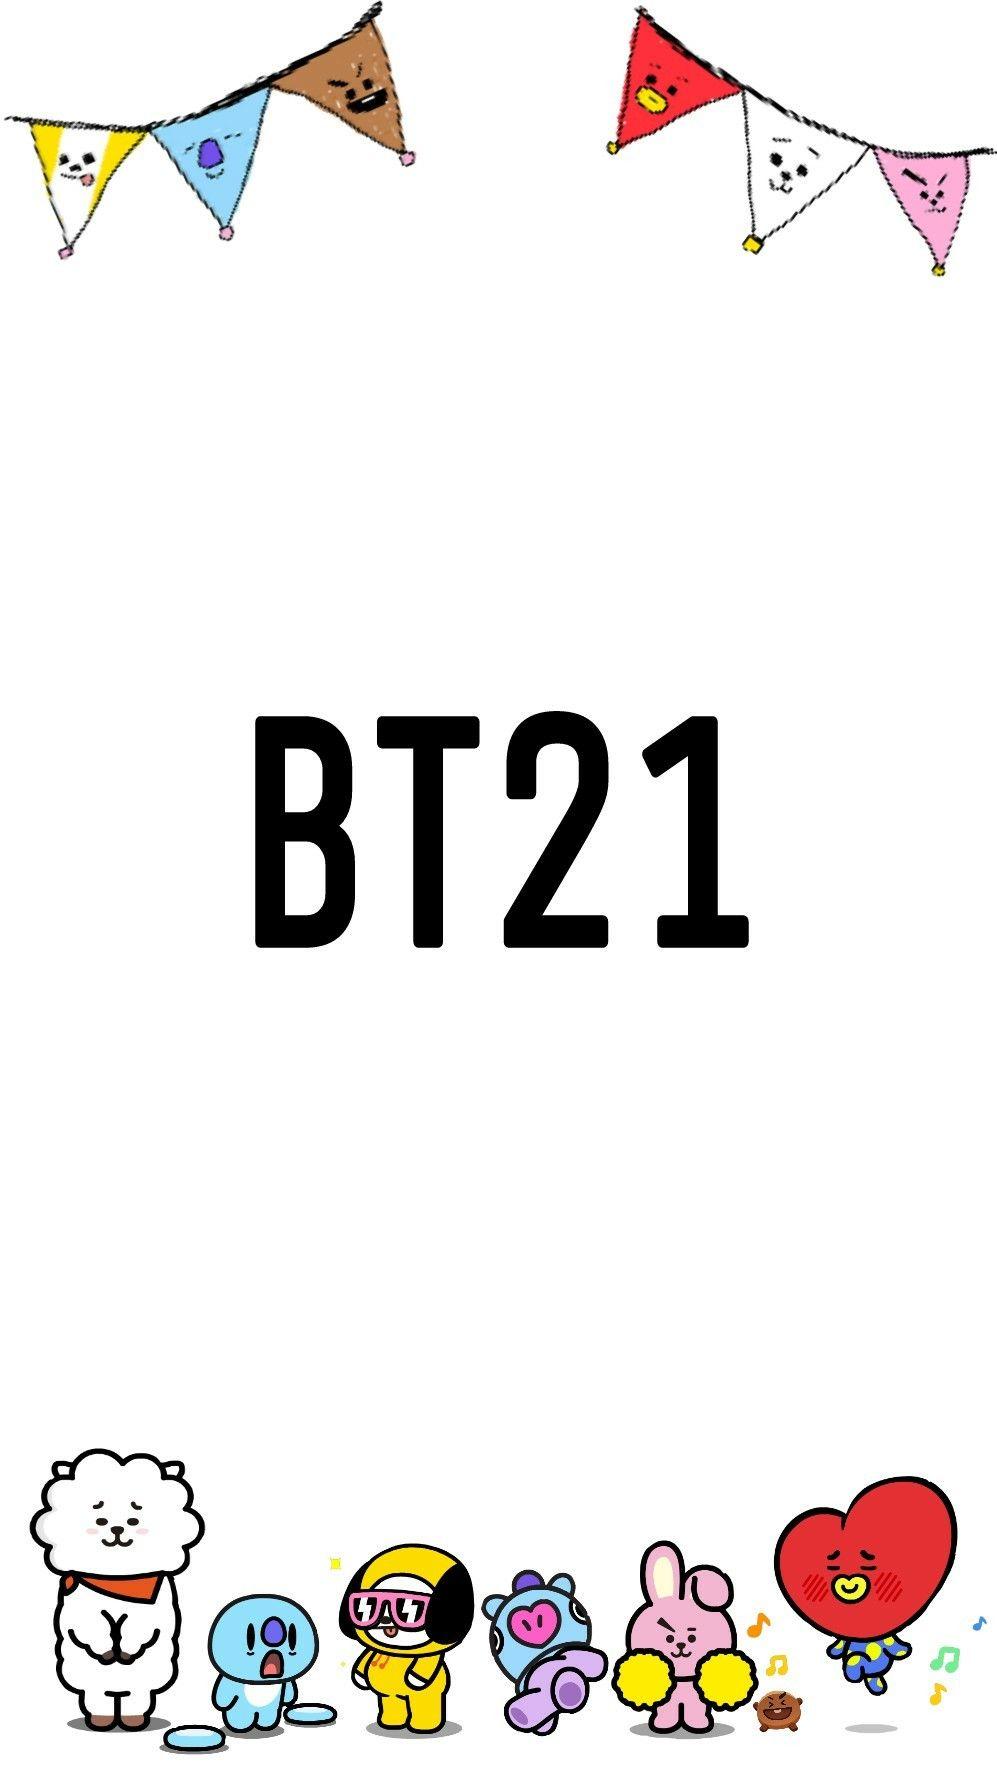 Free Download Bts Bt21 Wallpaper Kpop Pics Pinterest Bts